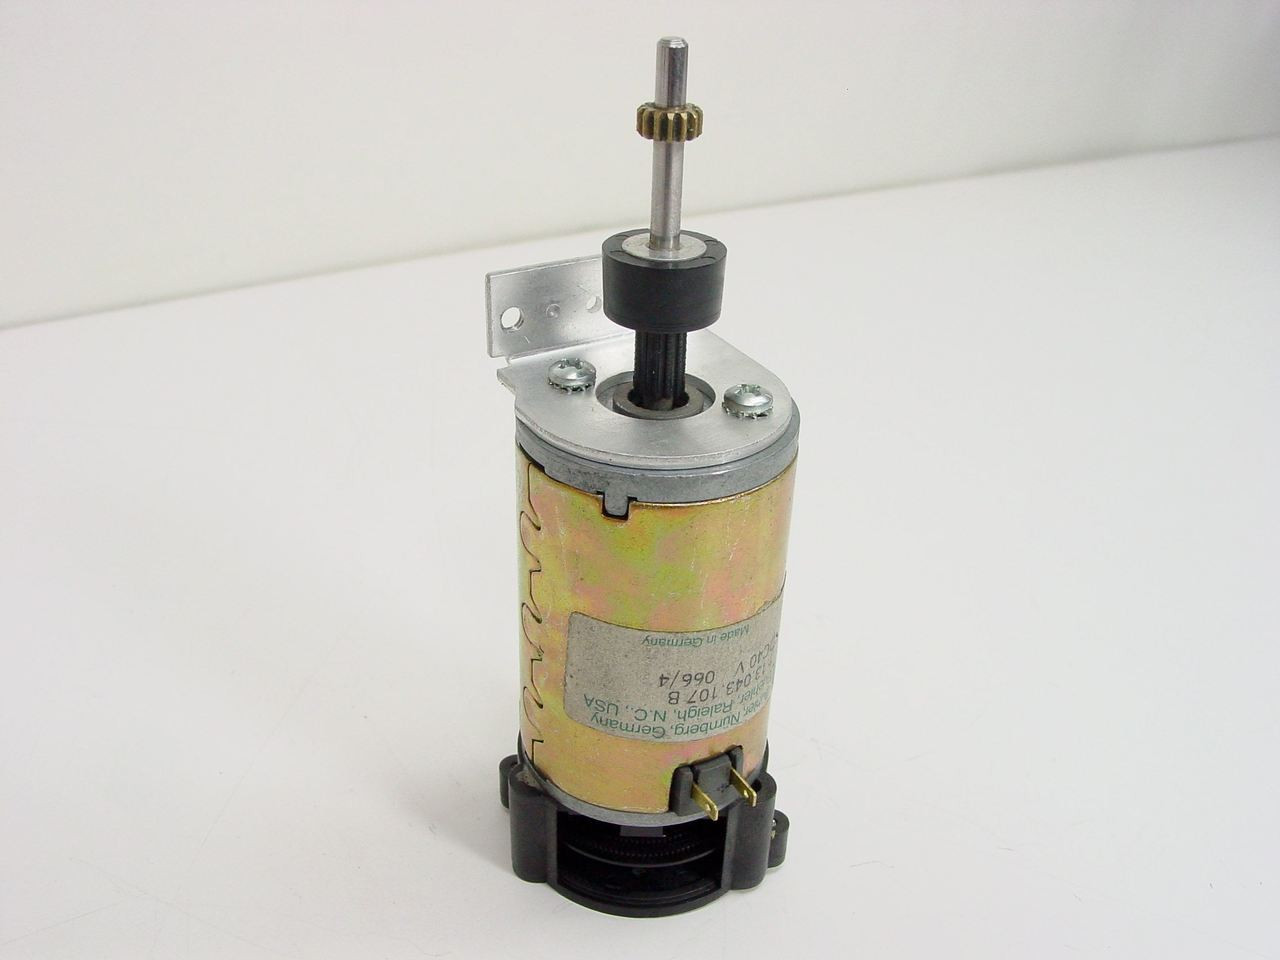 buhler 48 volt dc motor 1 13 043 107  [ 1280 x 960 Pixel ]